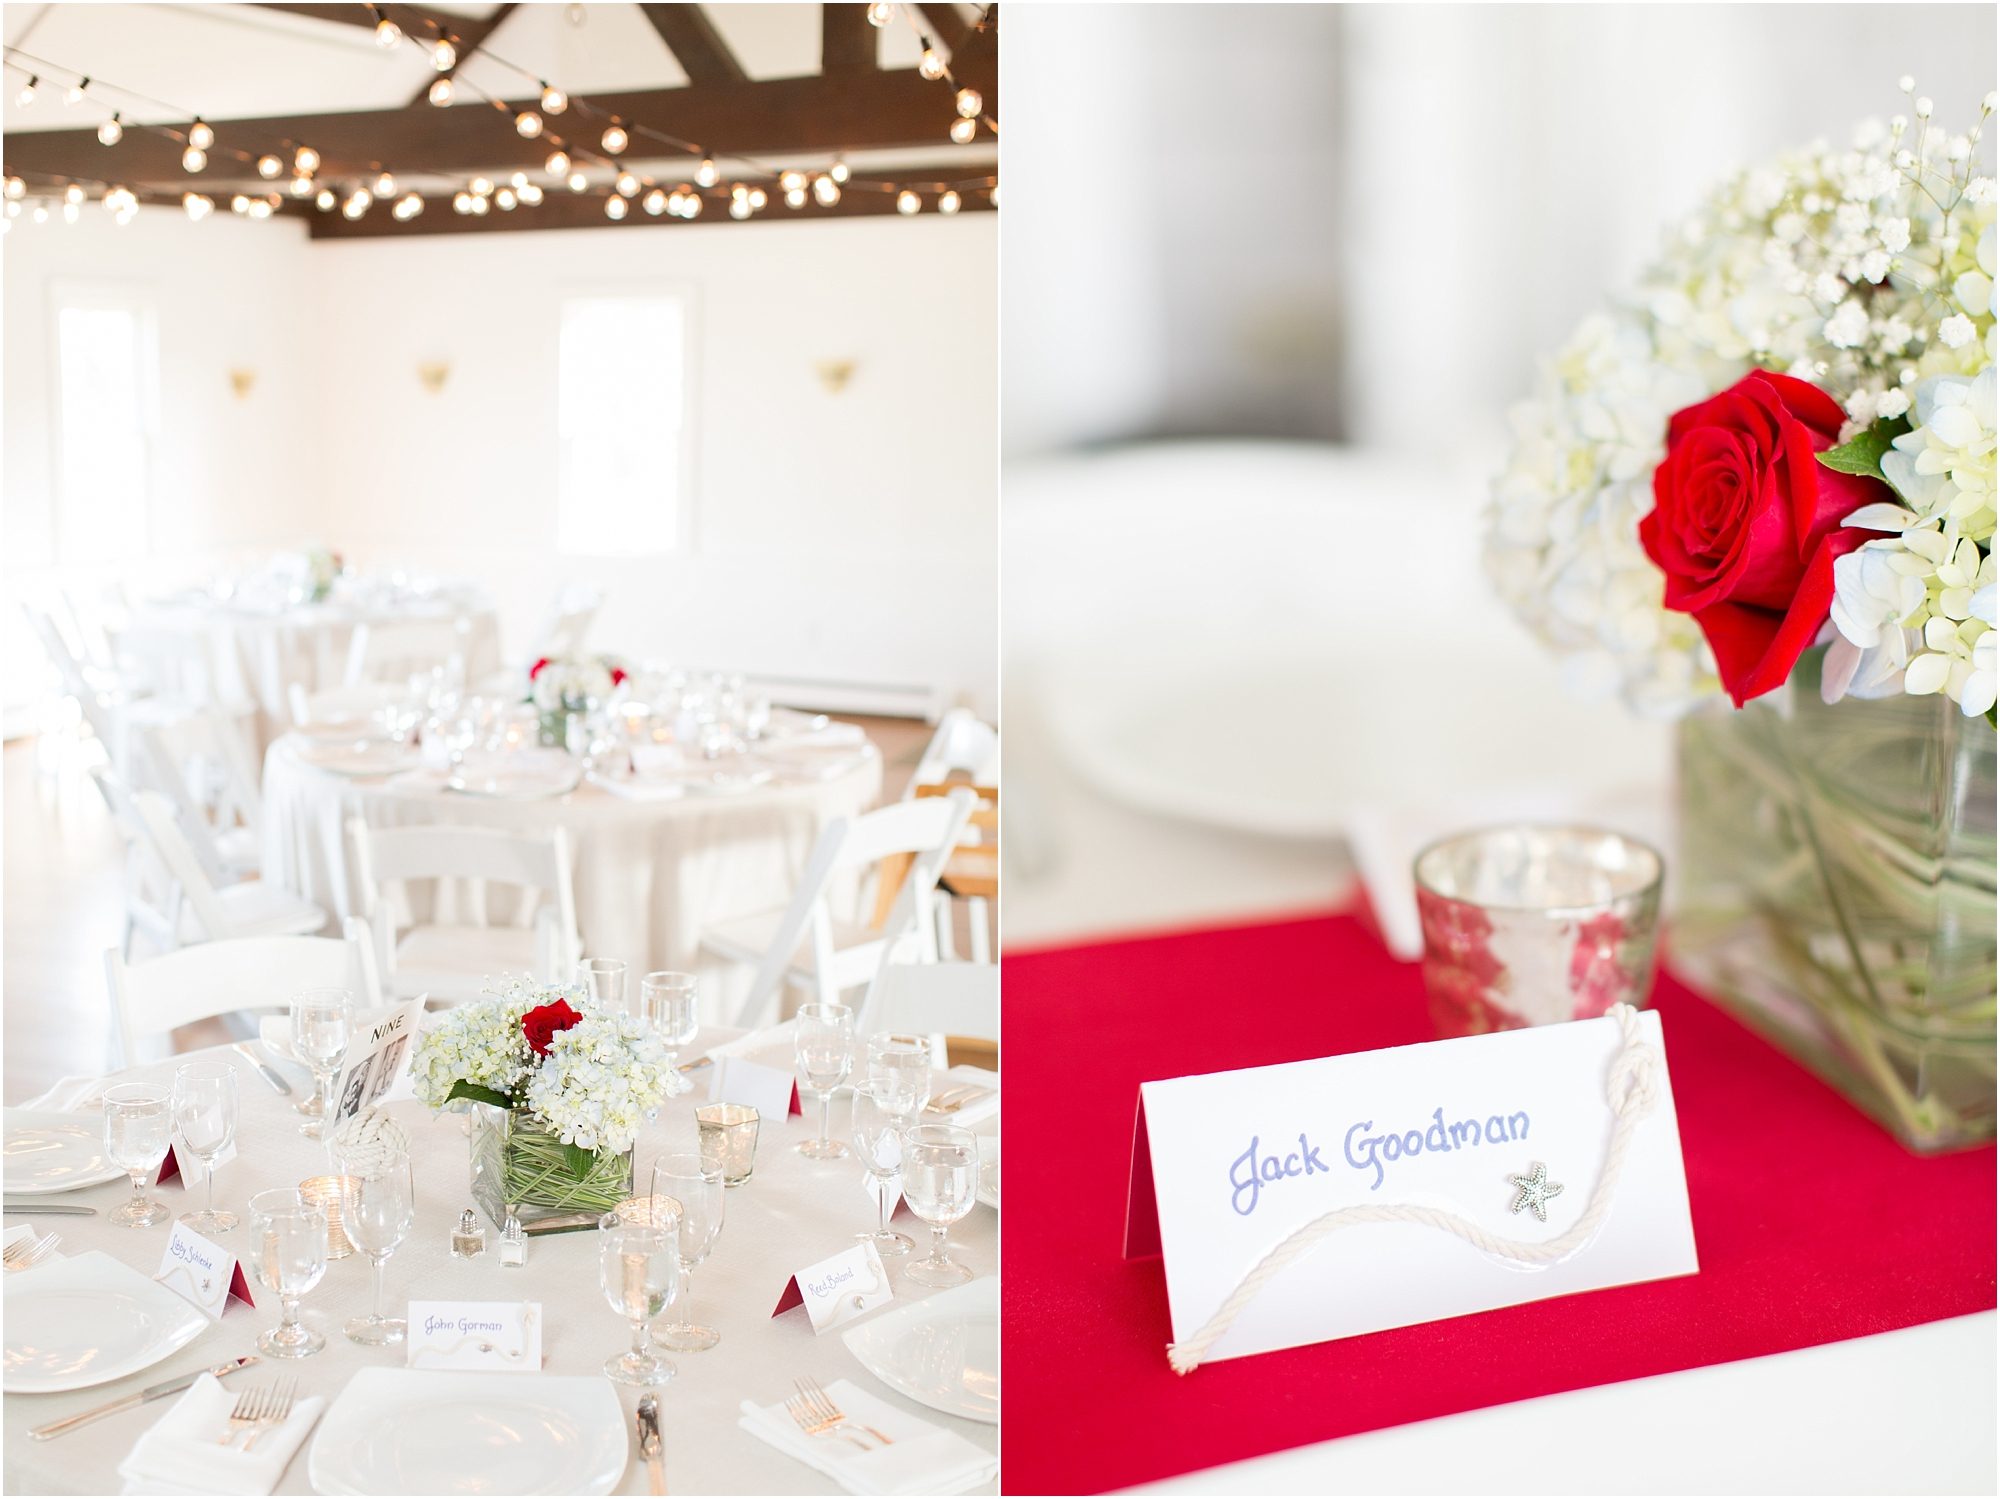 Goodman 7-Reception-581_anna grace photography wellfleet cape cod massachusetts destination wedding photographer Chequessett Yacht and Country Club wedding photo.jpg